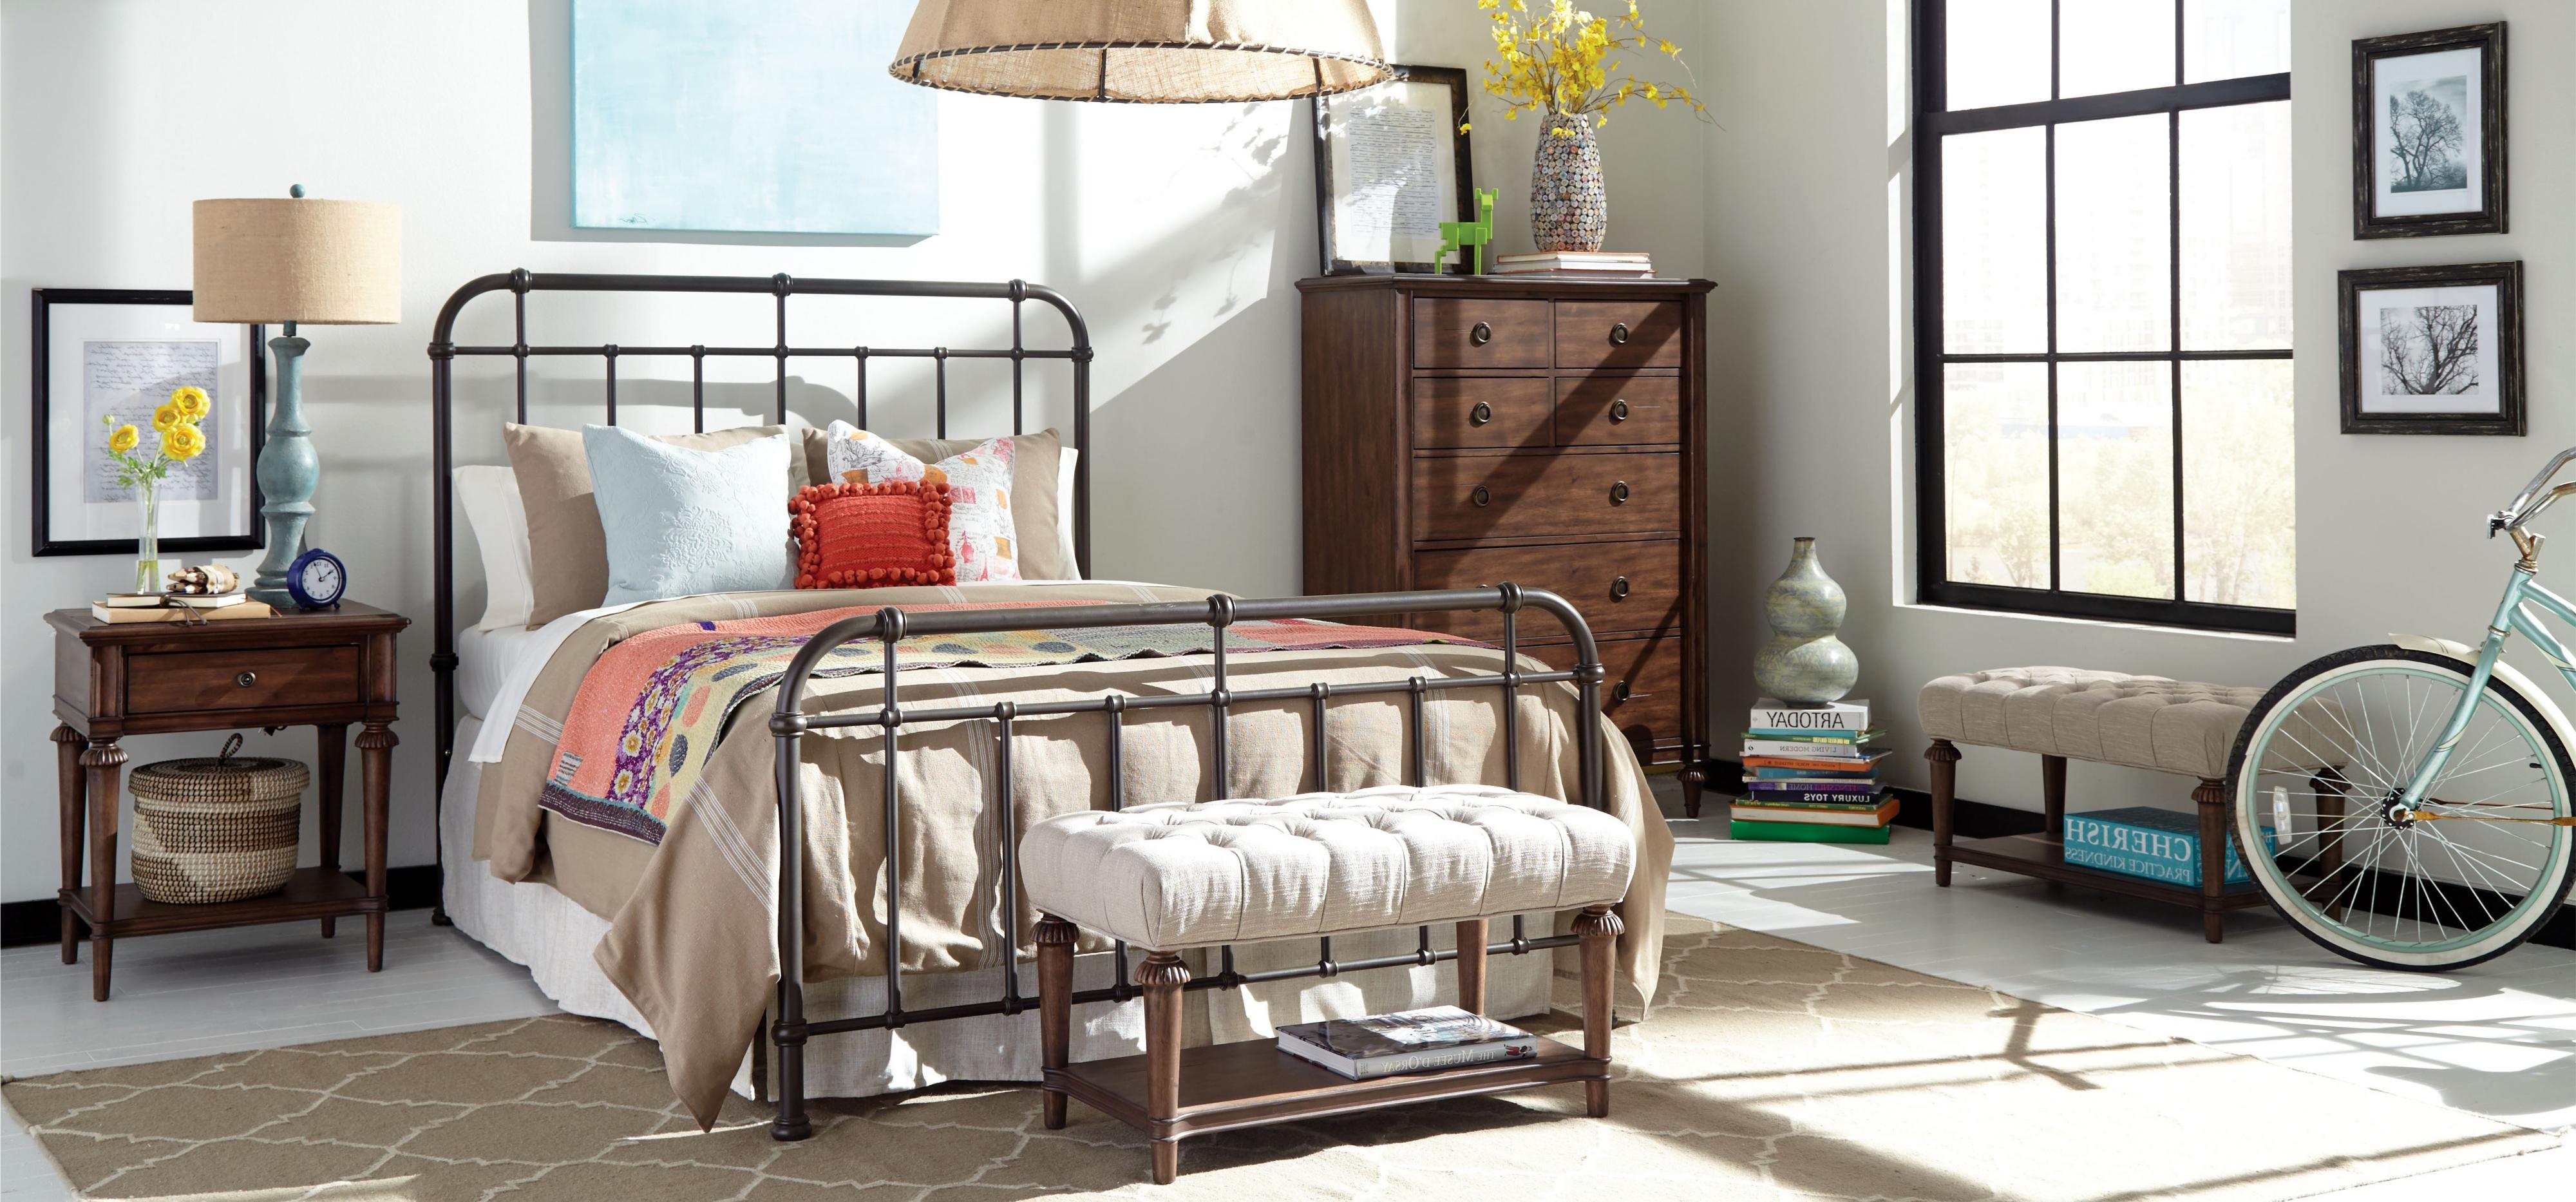 Broyhill Bedroom Jordan Furniture